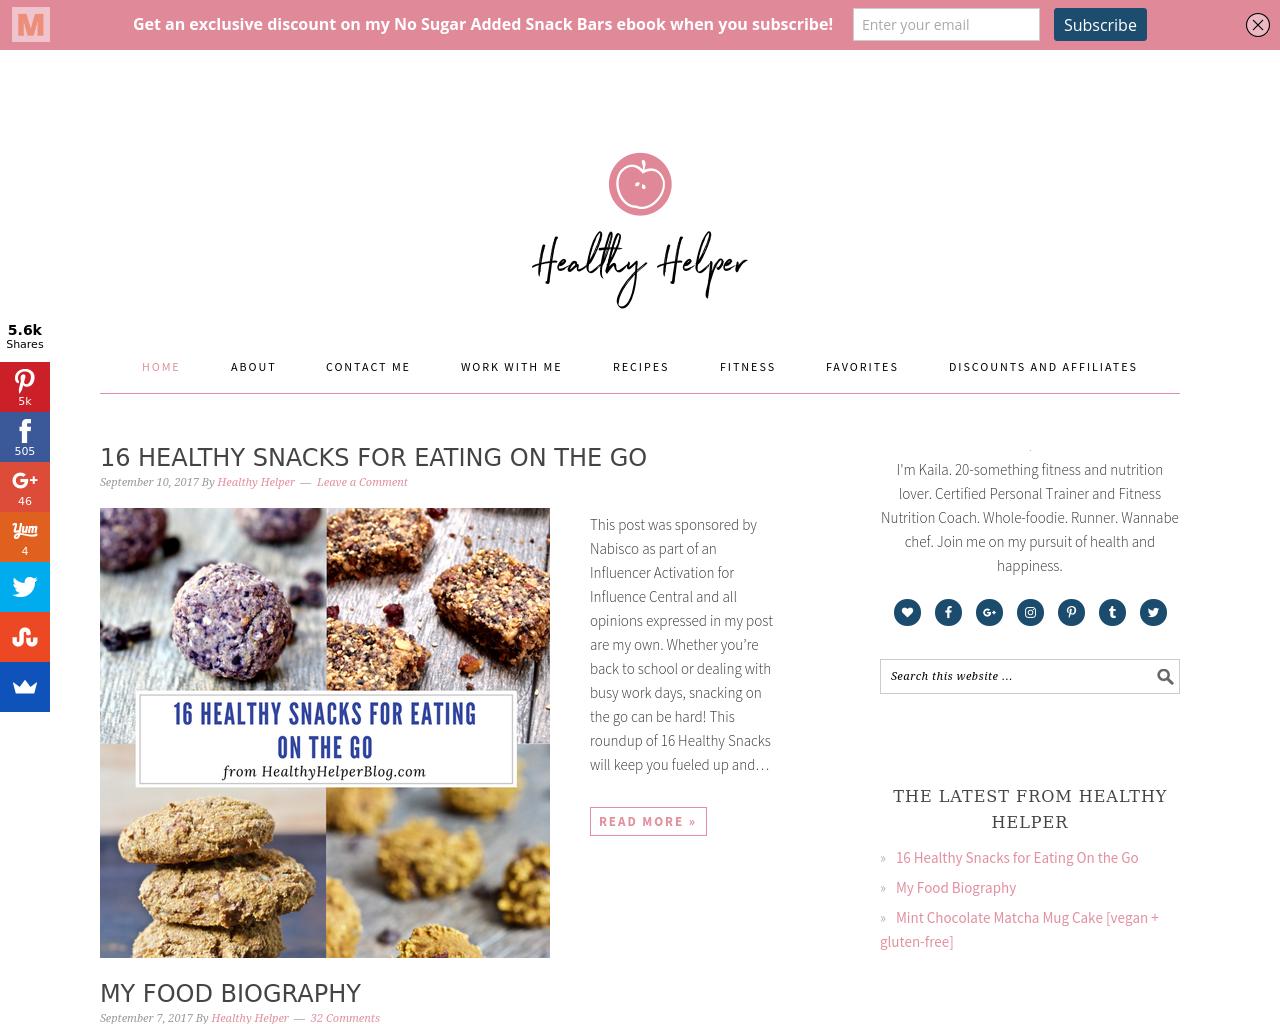 Healthyhelperblog-Advertising-Reviews-Pricing